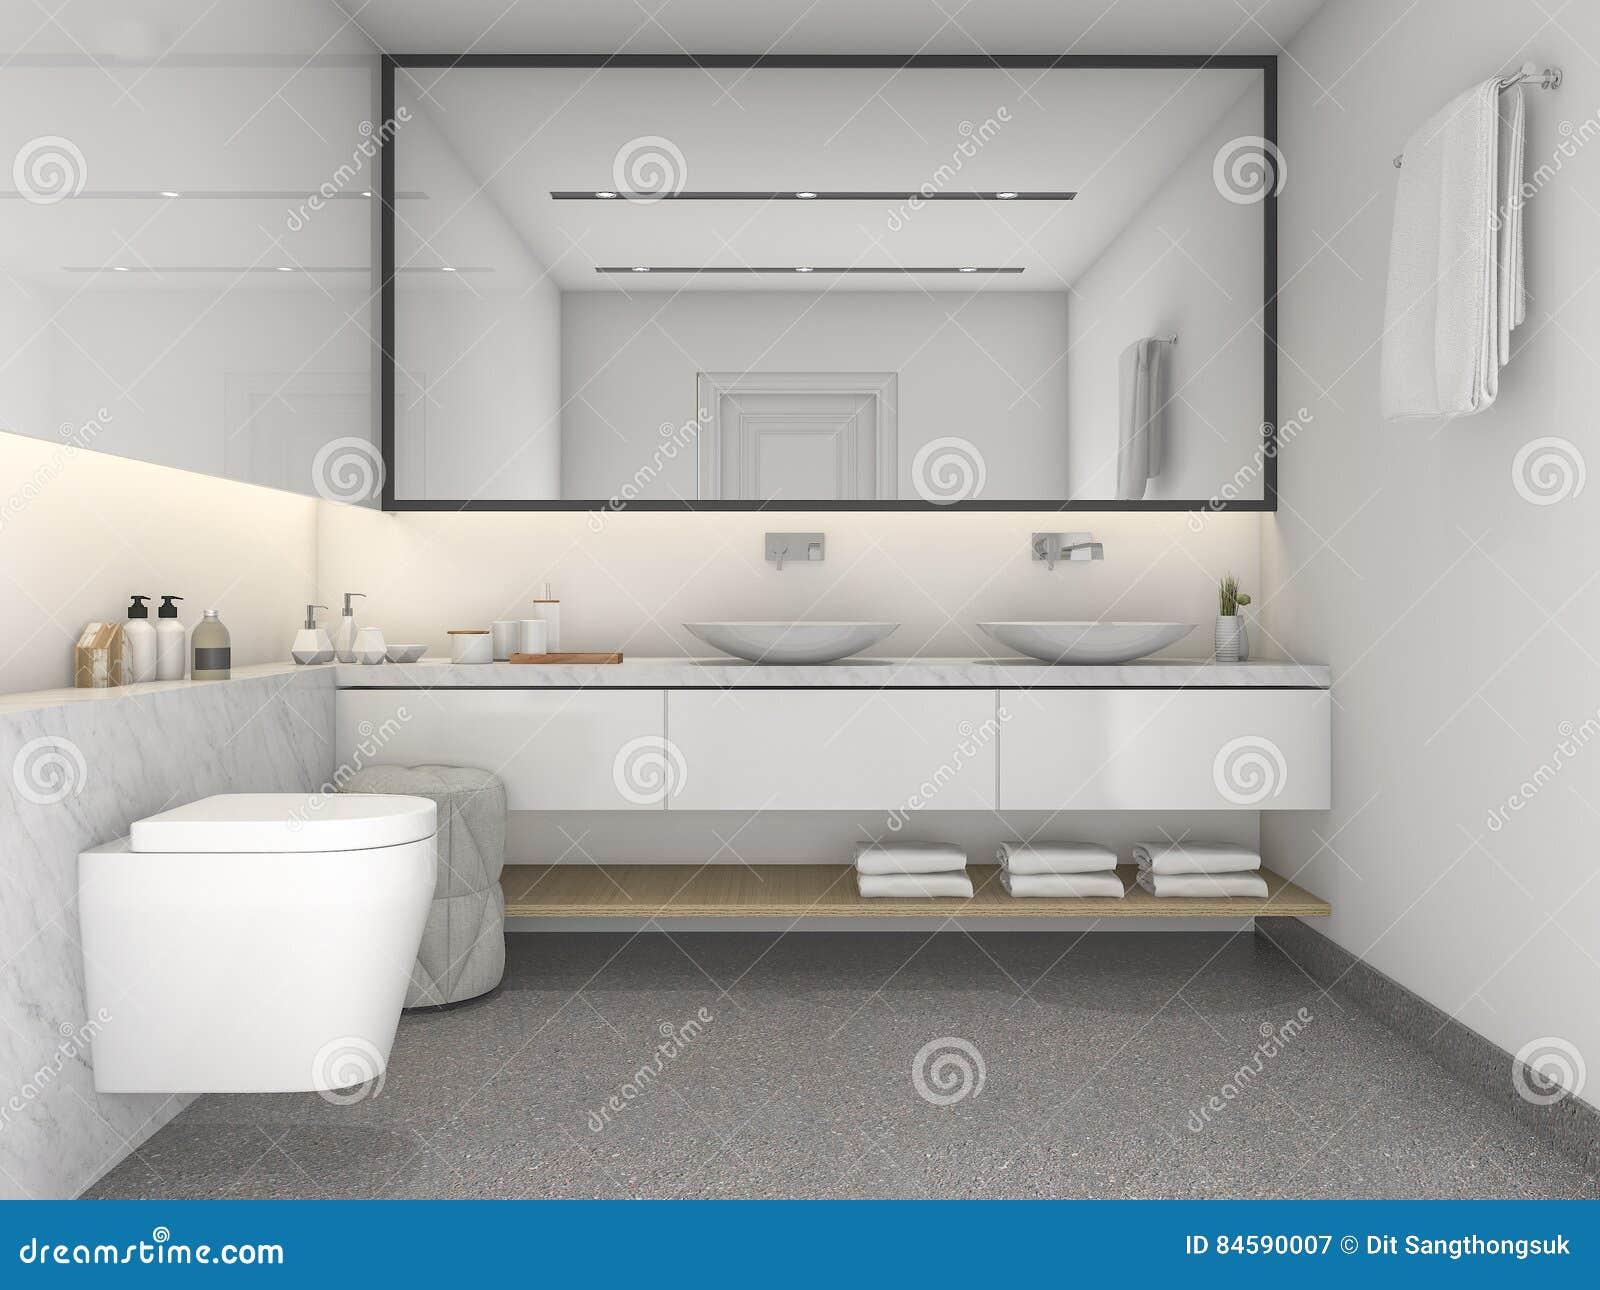 Download 3d Rendering Brick Minimal Toilet And Bathroom Stock Illustration